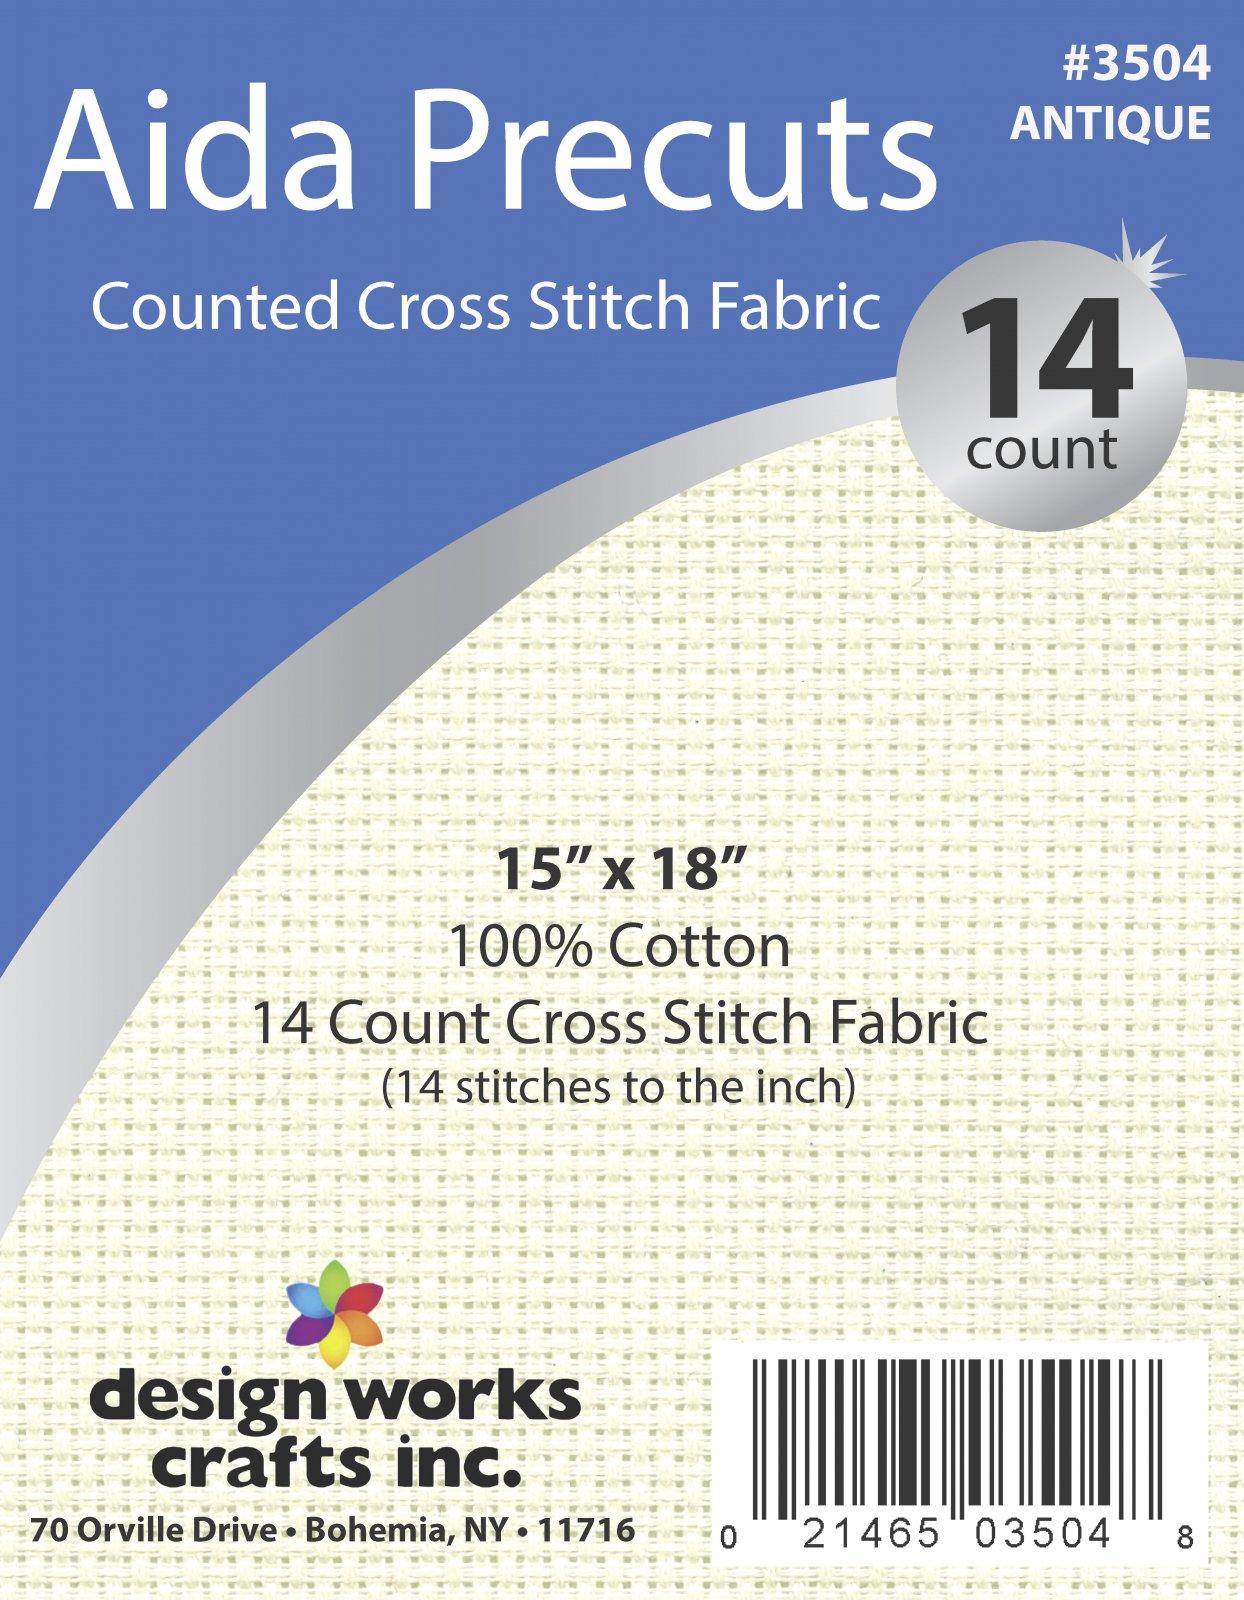 # 3504 - 14 Ct. Aida Pre-cut Counted Cross Stitch Fabric/Antique White - 15 x 18